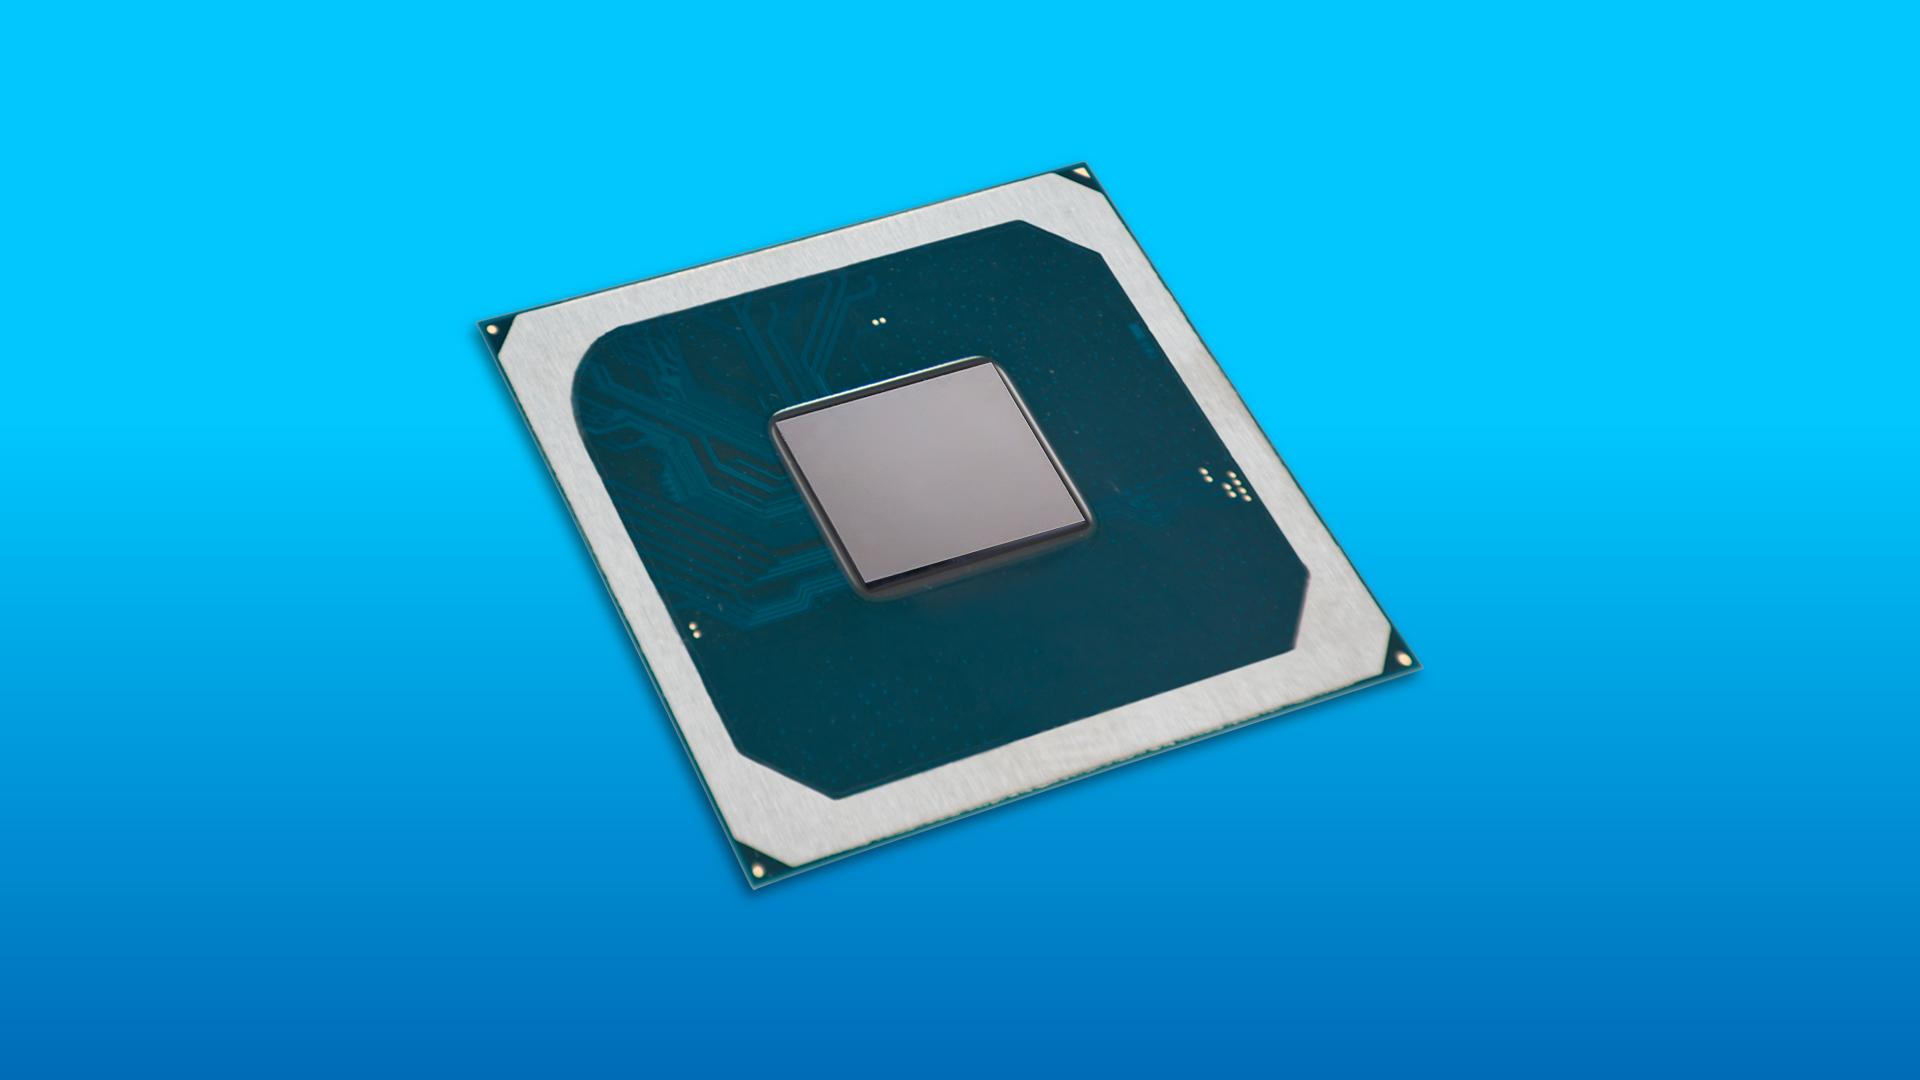 intel server gpu chip 2 อินเทลเดินหน้าวิสัยทัศน์ XPU ด้วย oneAPI และ Intel Server GPU